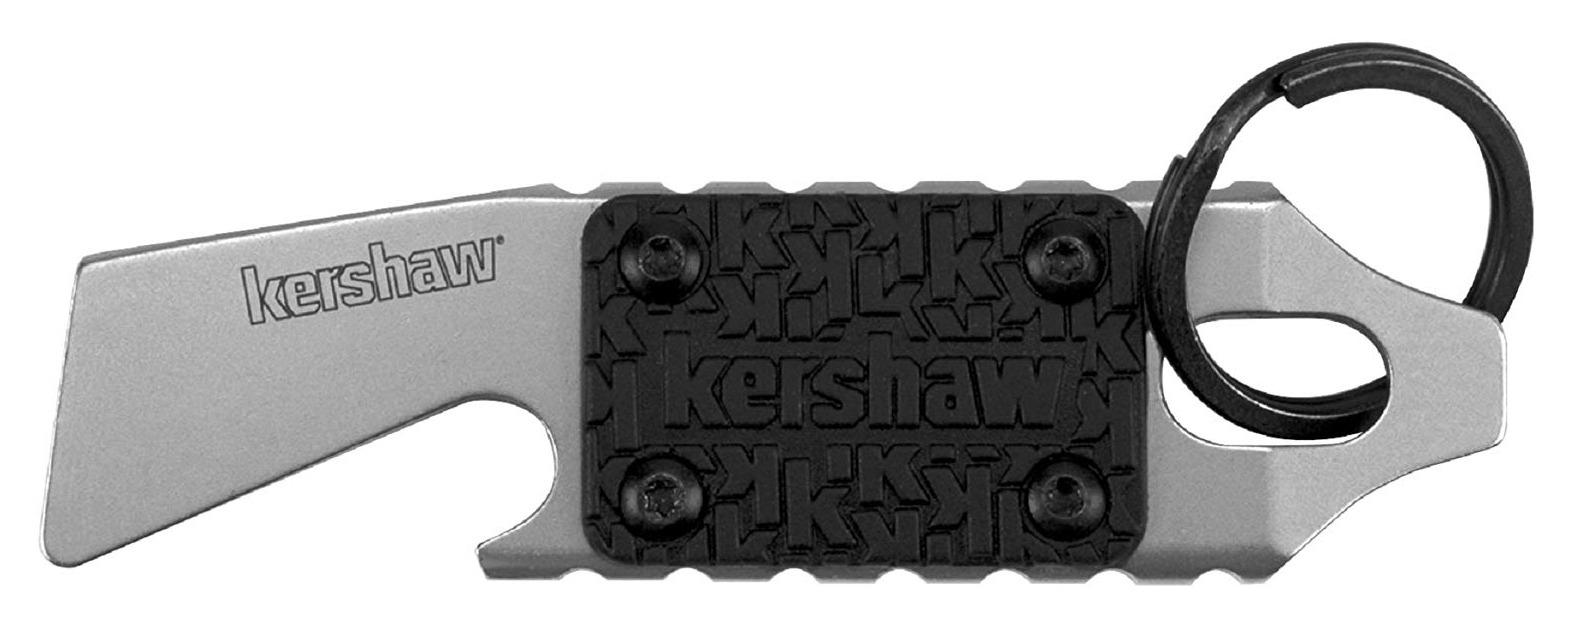 Kershaw PT-1 Keychain Tool 5